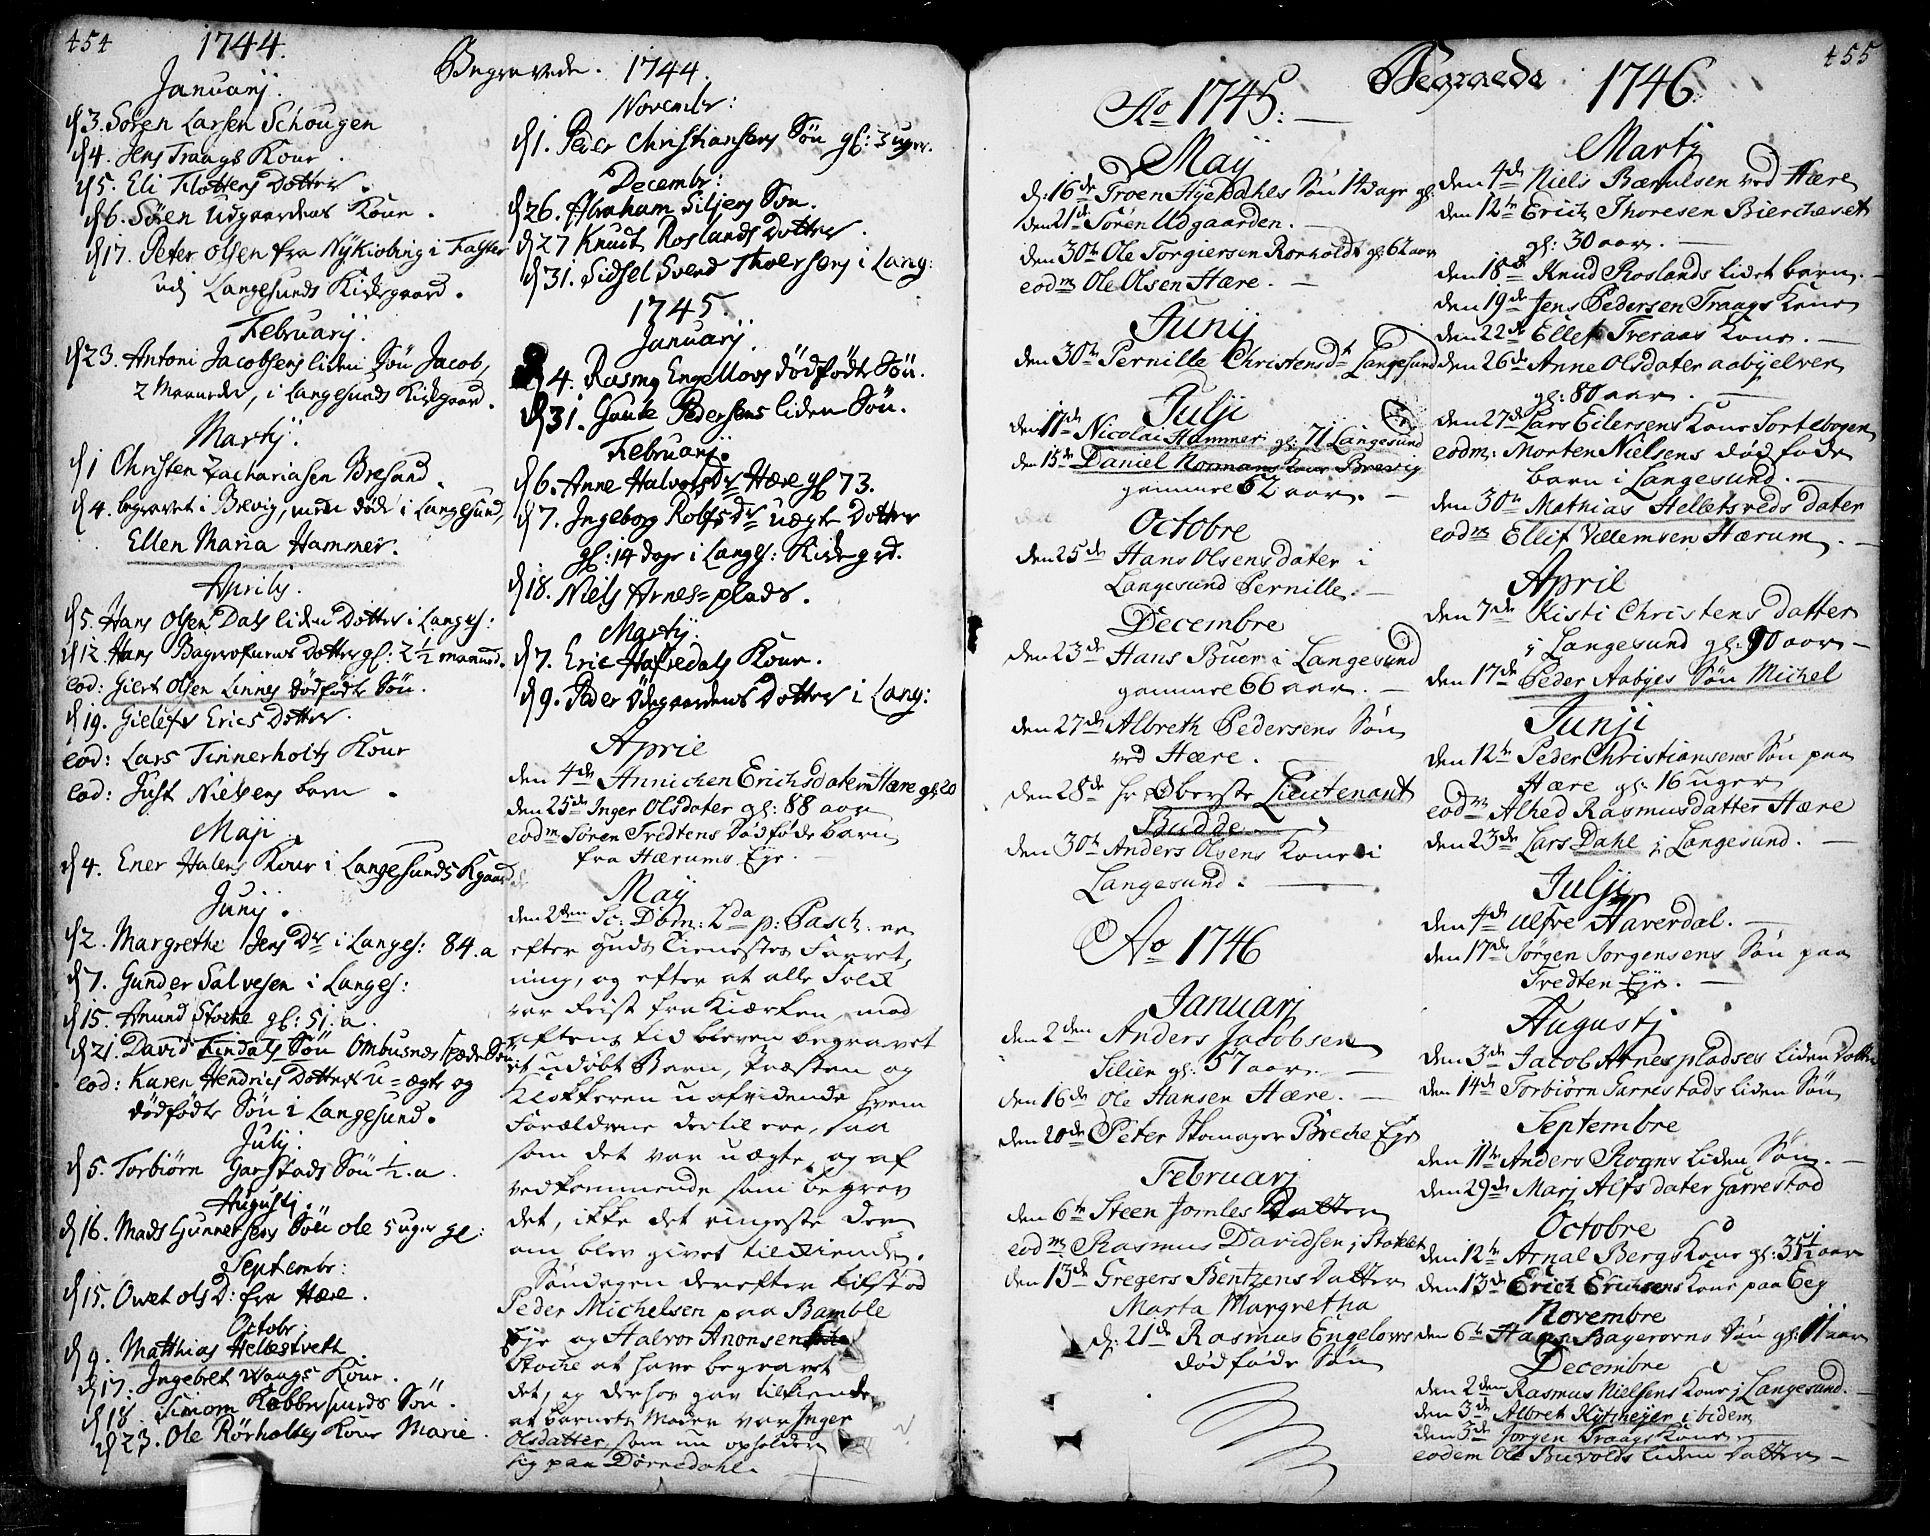 SAKO, Bamble kirkebøker, F/Fa/L0001: Ministerialbok nr. I 1, 1702-1774, s. 454-455